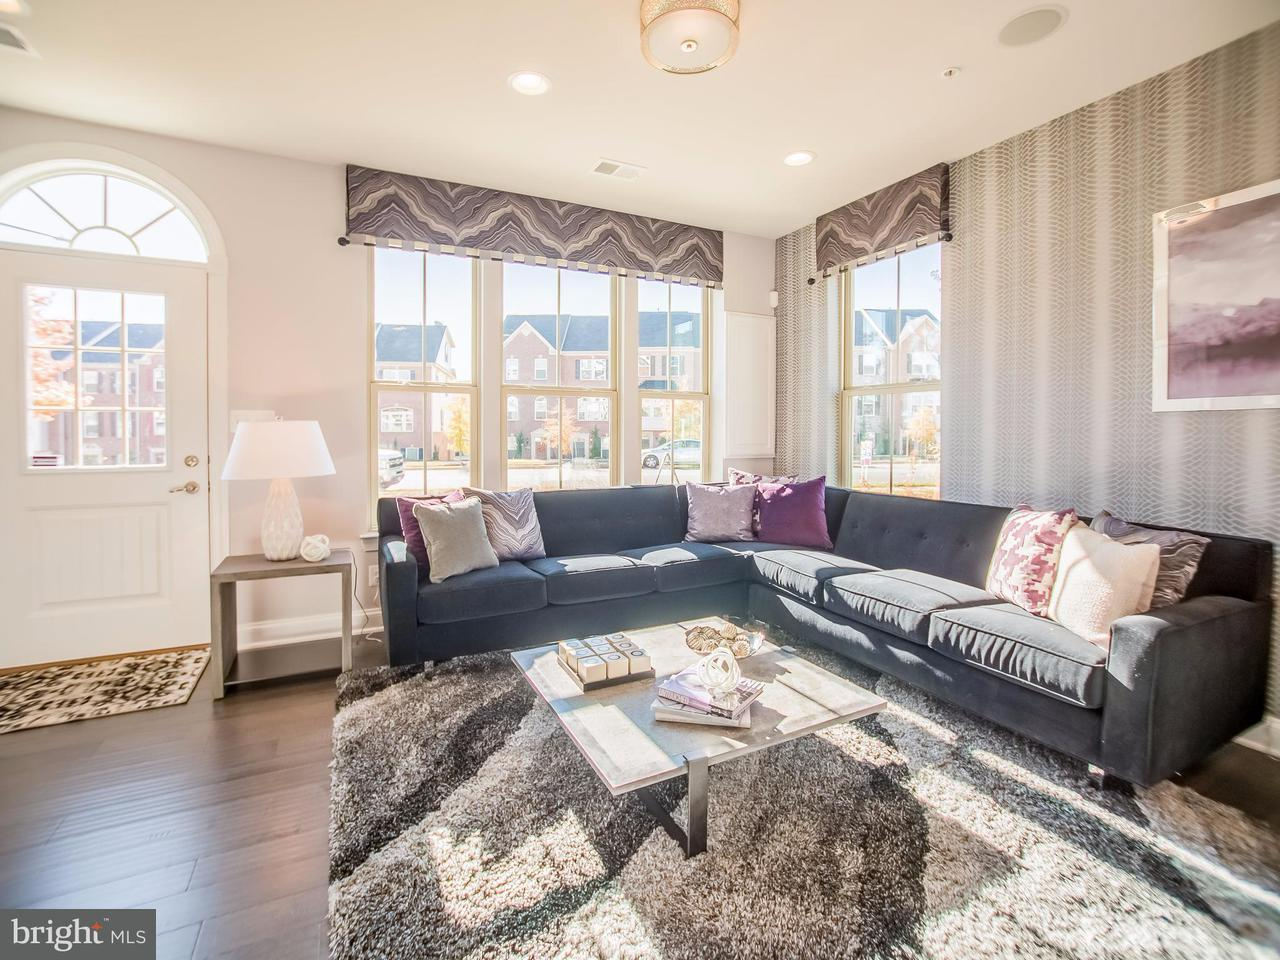 Additional photo for property listing at 3701 Jamison St NE  Washington, District Of Columbia 20018 United States